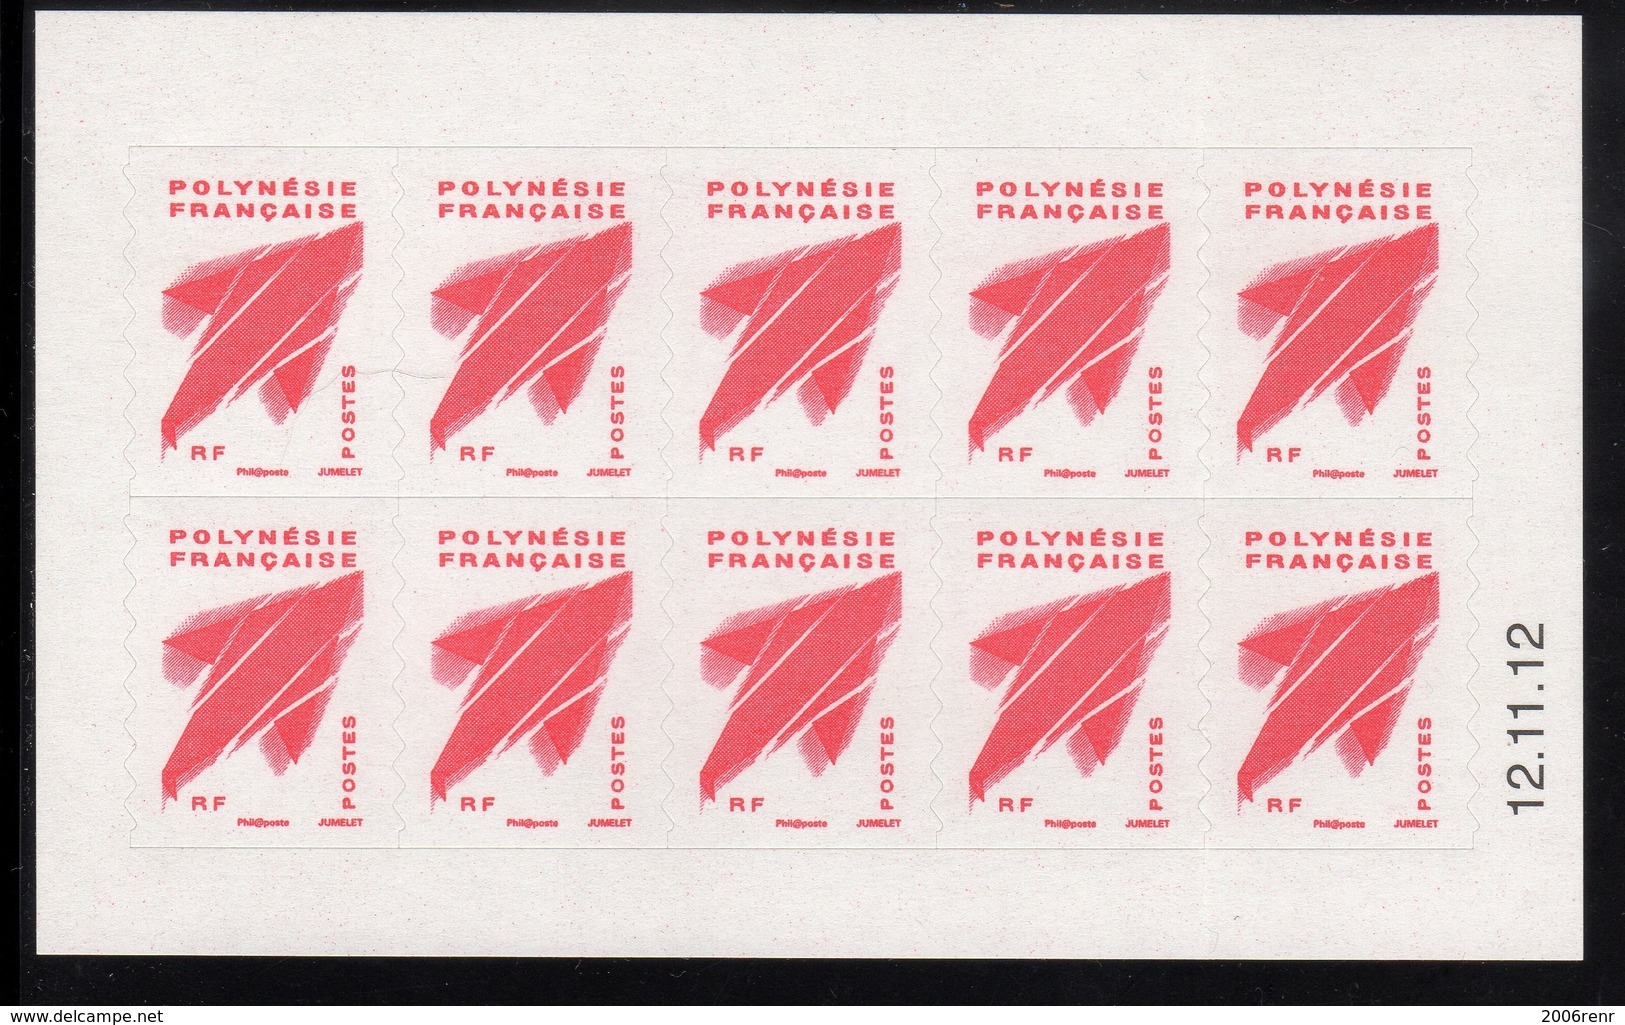 POLYNESIE. CARNET A USAGE COURANT MARARA  C977-3 CD 12/11/12  VOIR DESCRIPTION. - Markenheftchen